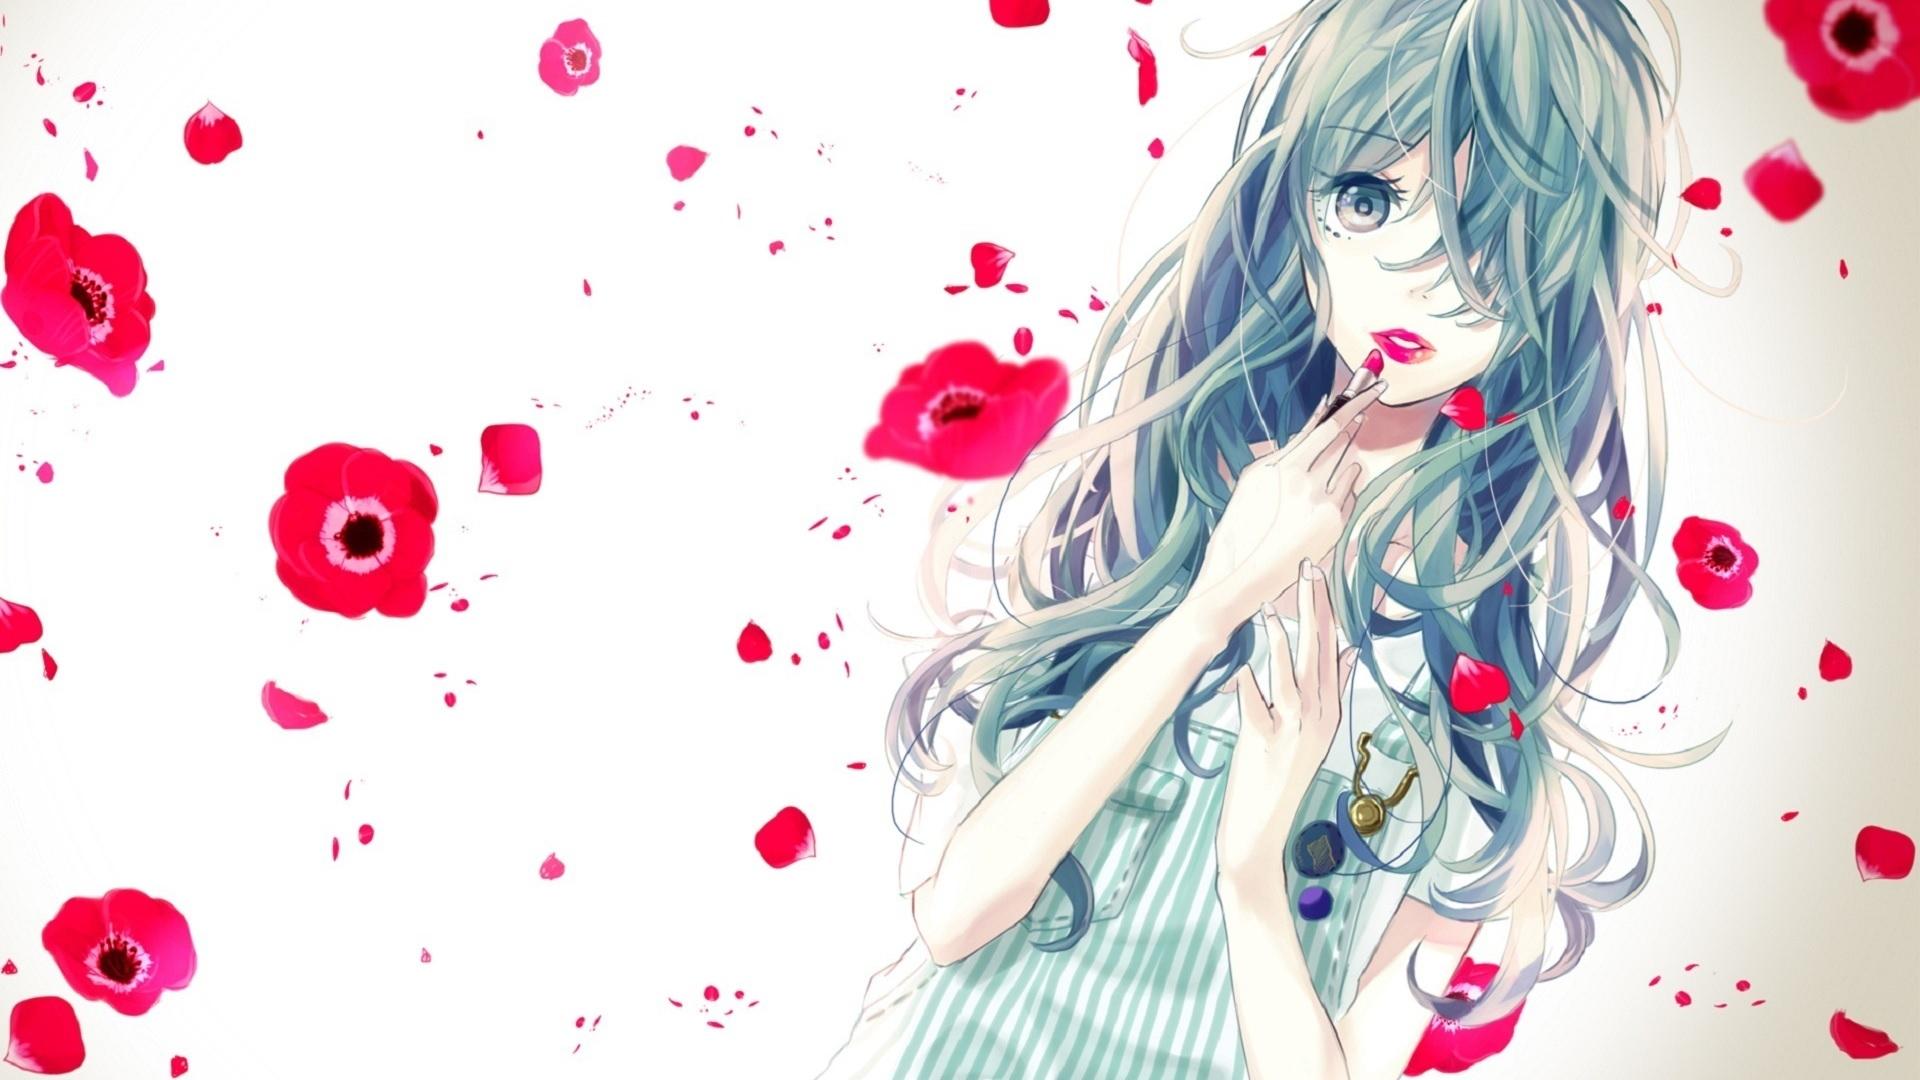 cute cartoon background